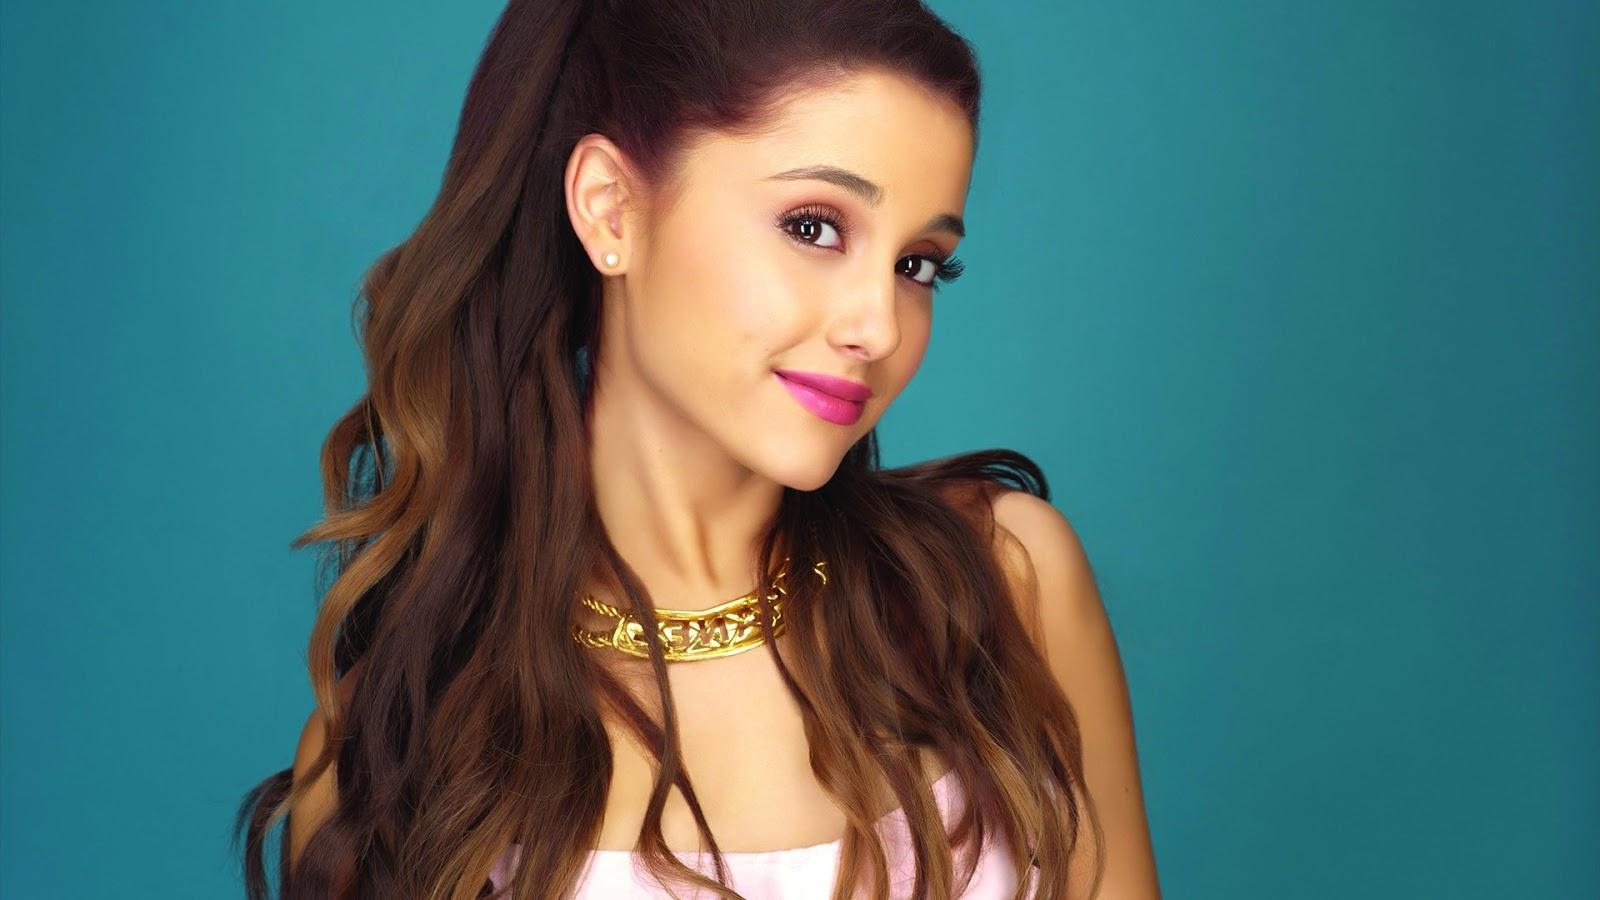 Singer Ariana Grande Wallpaper